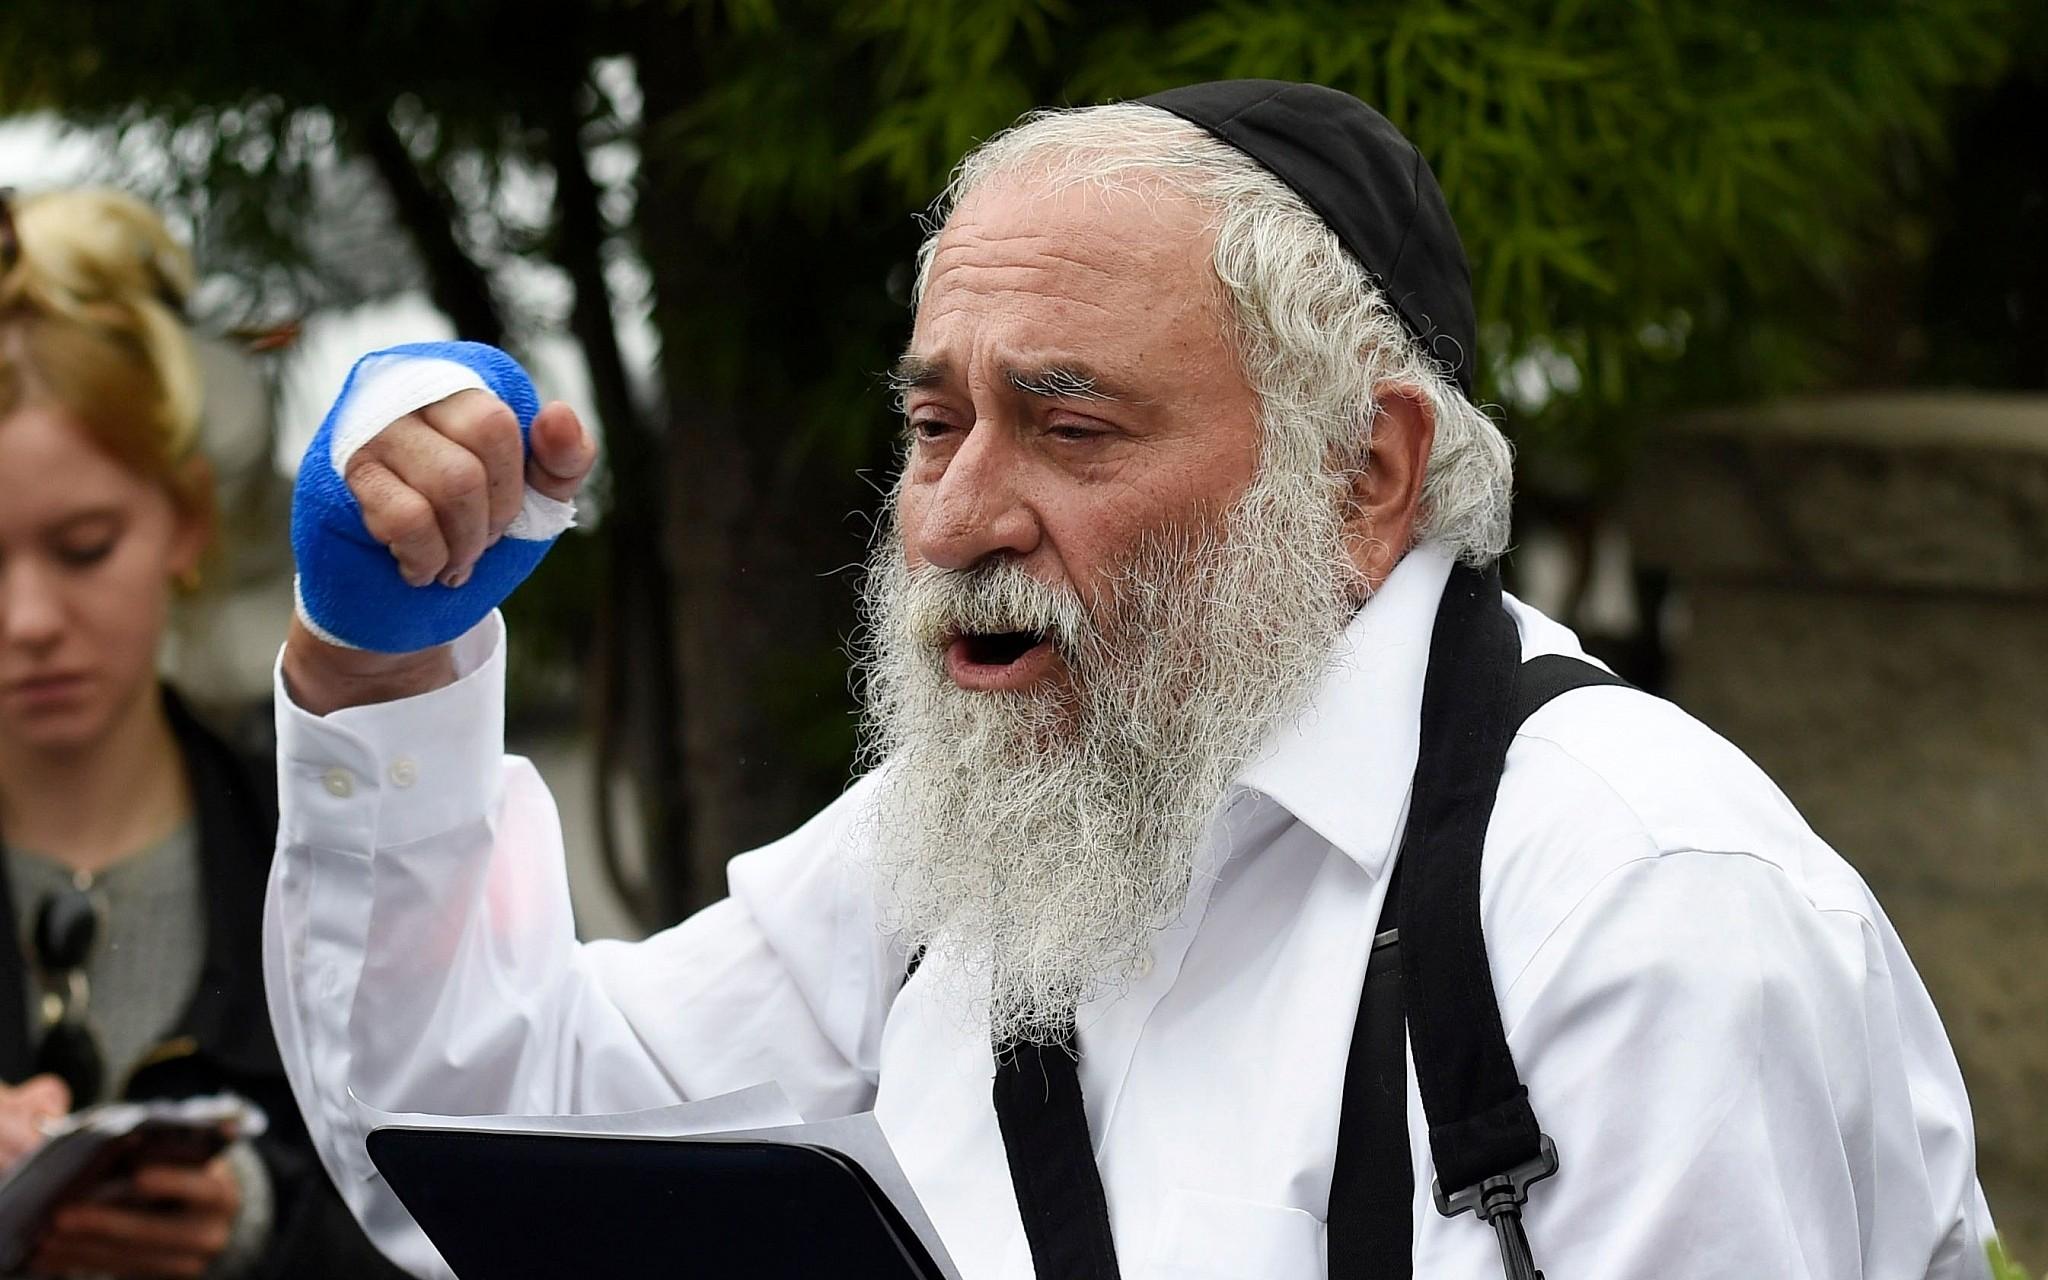 Poway Chabad rabbi had asked border patrol agent to pray armed